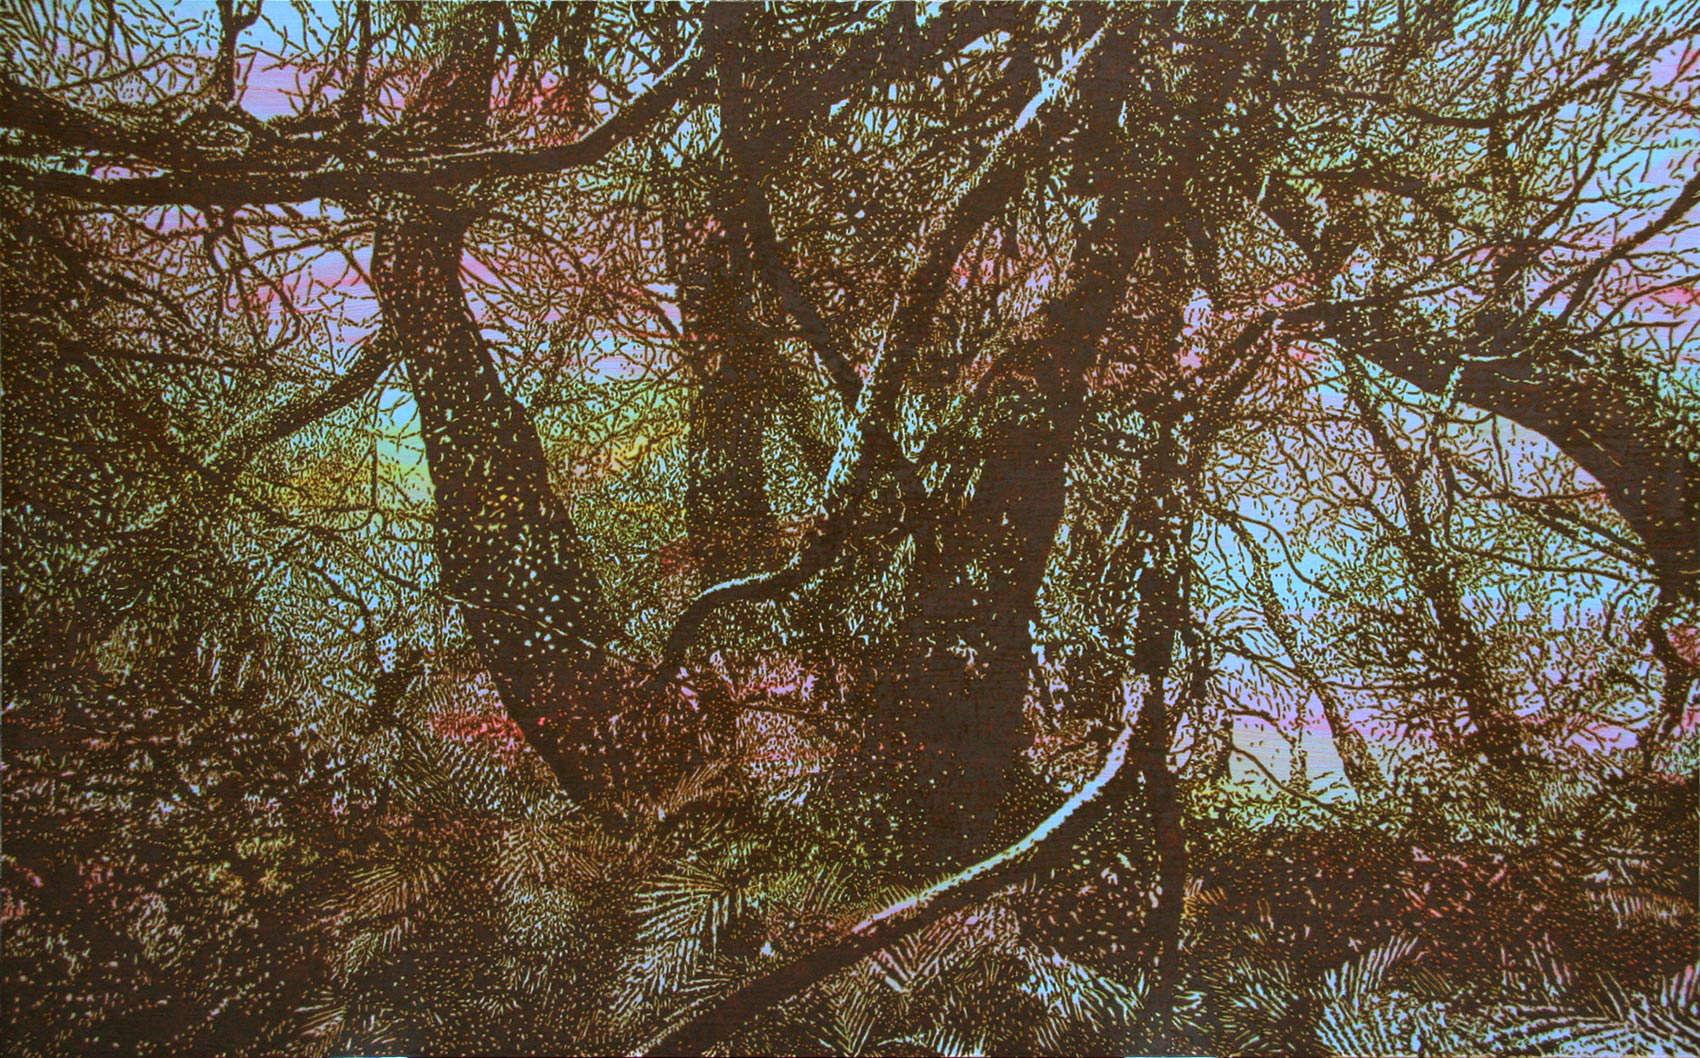 Primary Forest 2, 2011, peinture alkyde sur Dibond, 125 x 205 cm